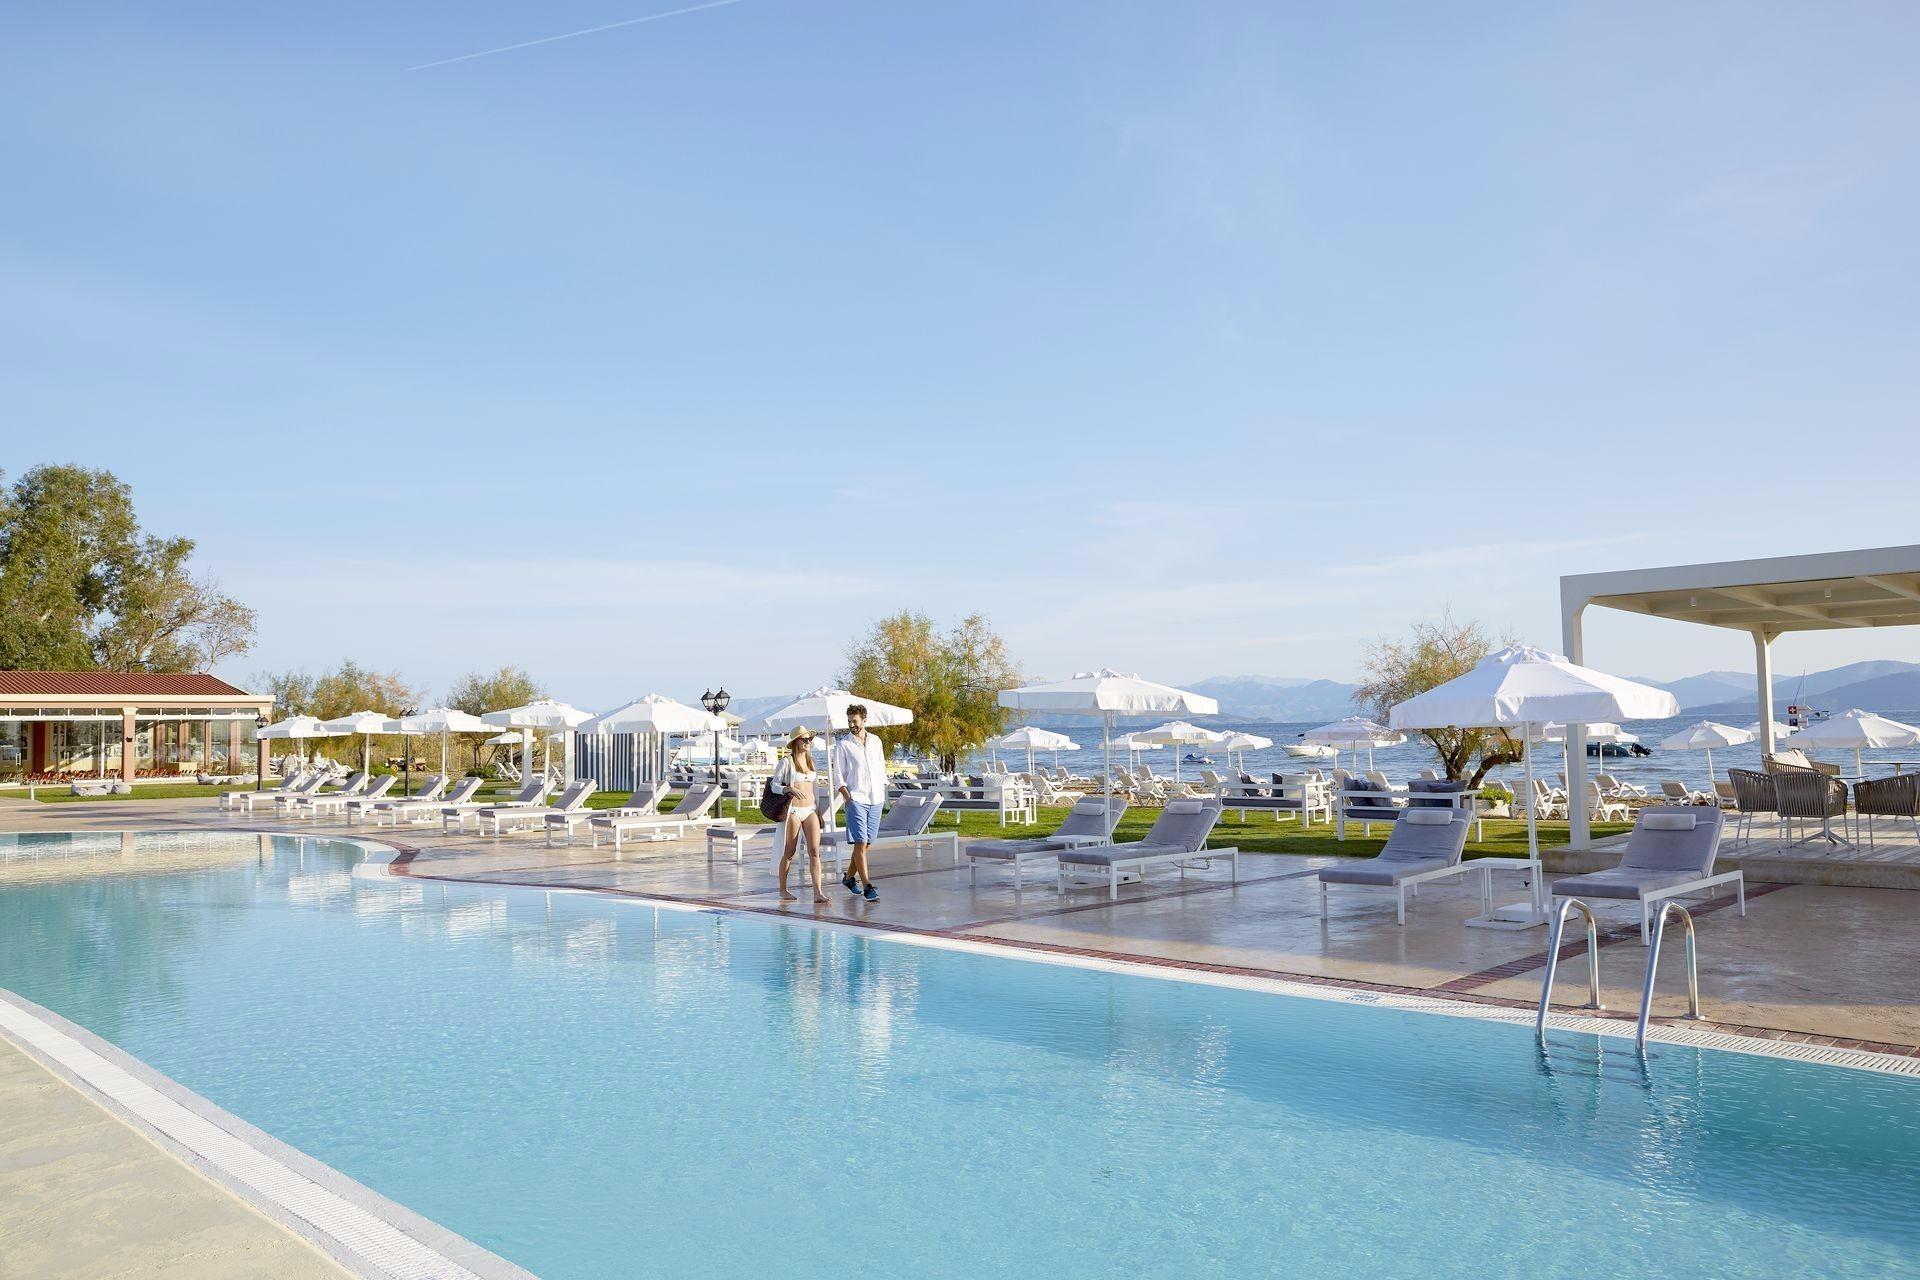 Mayor Capo Di Corfu Family Beach Resort In Corfu Island :  Mayorcapodicorfu.com